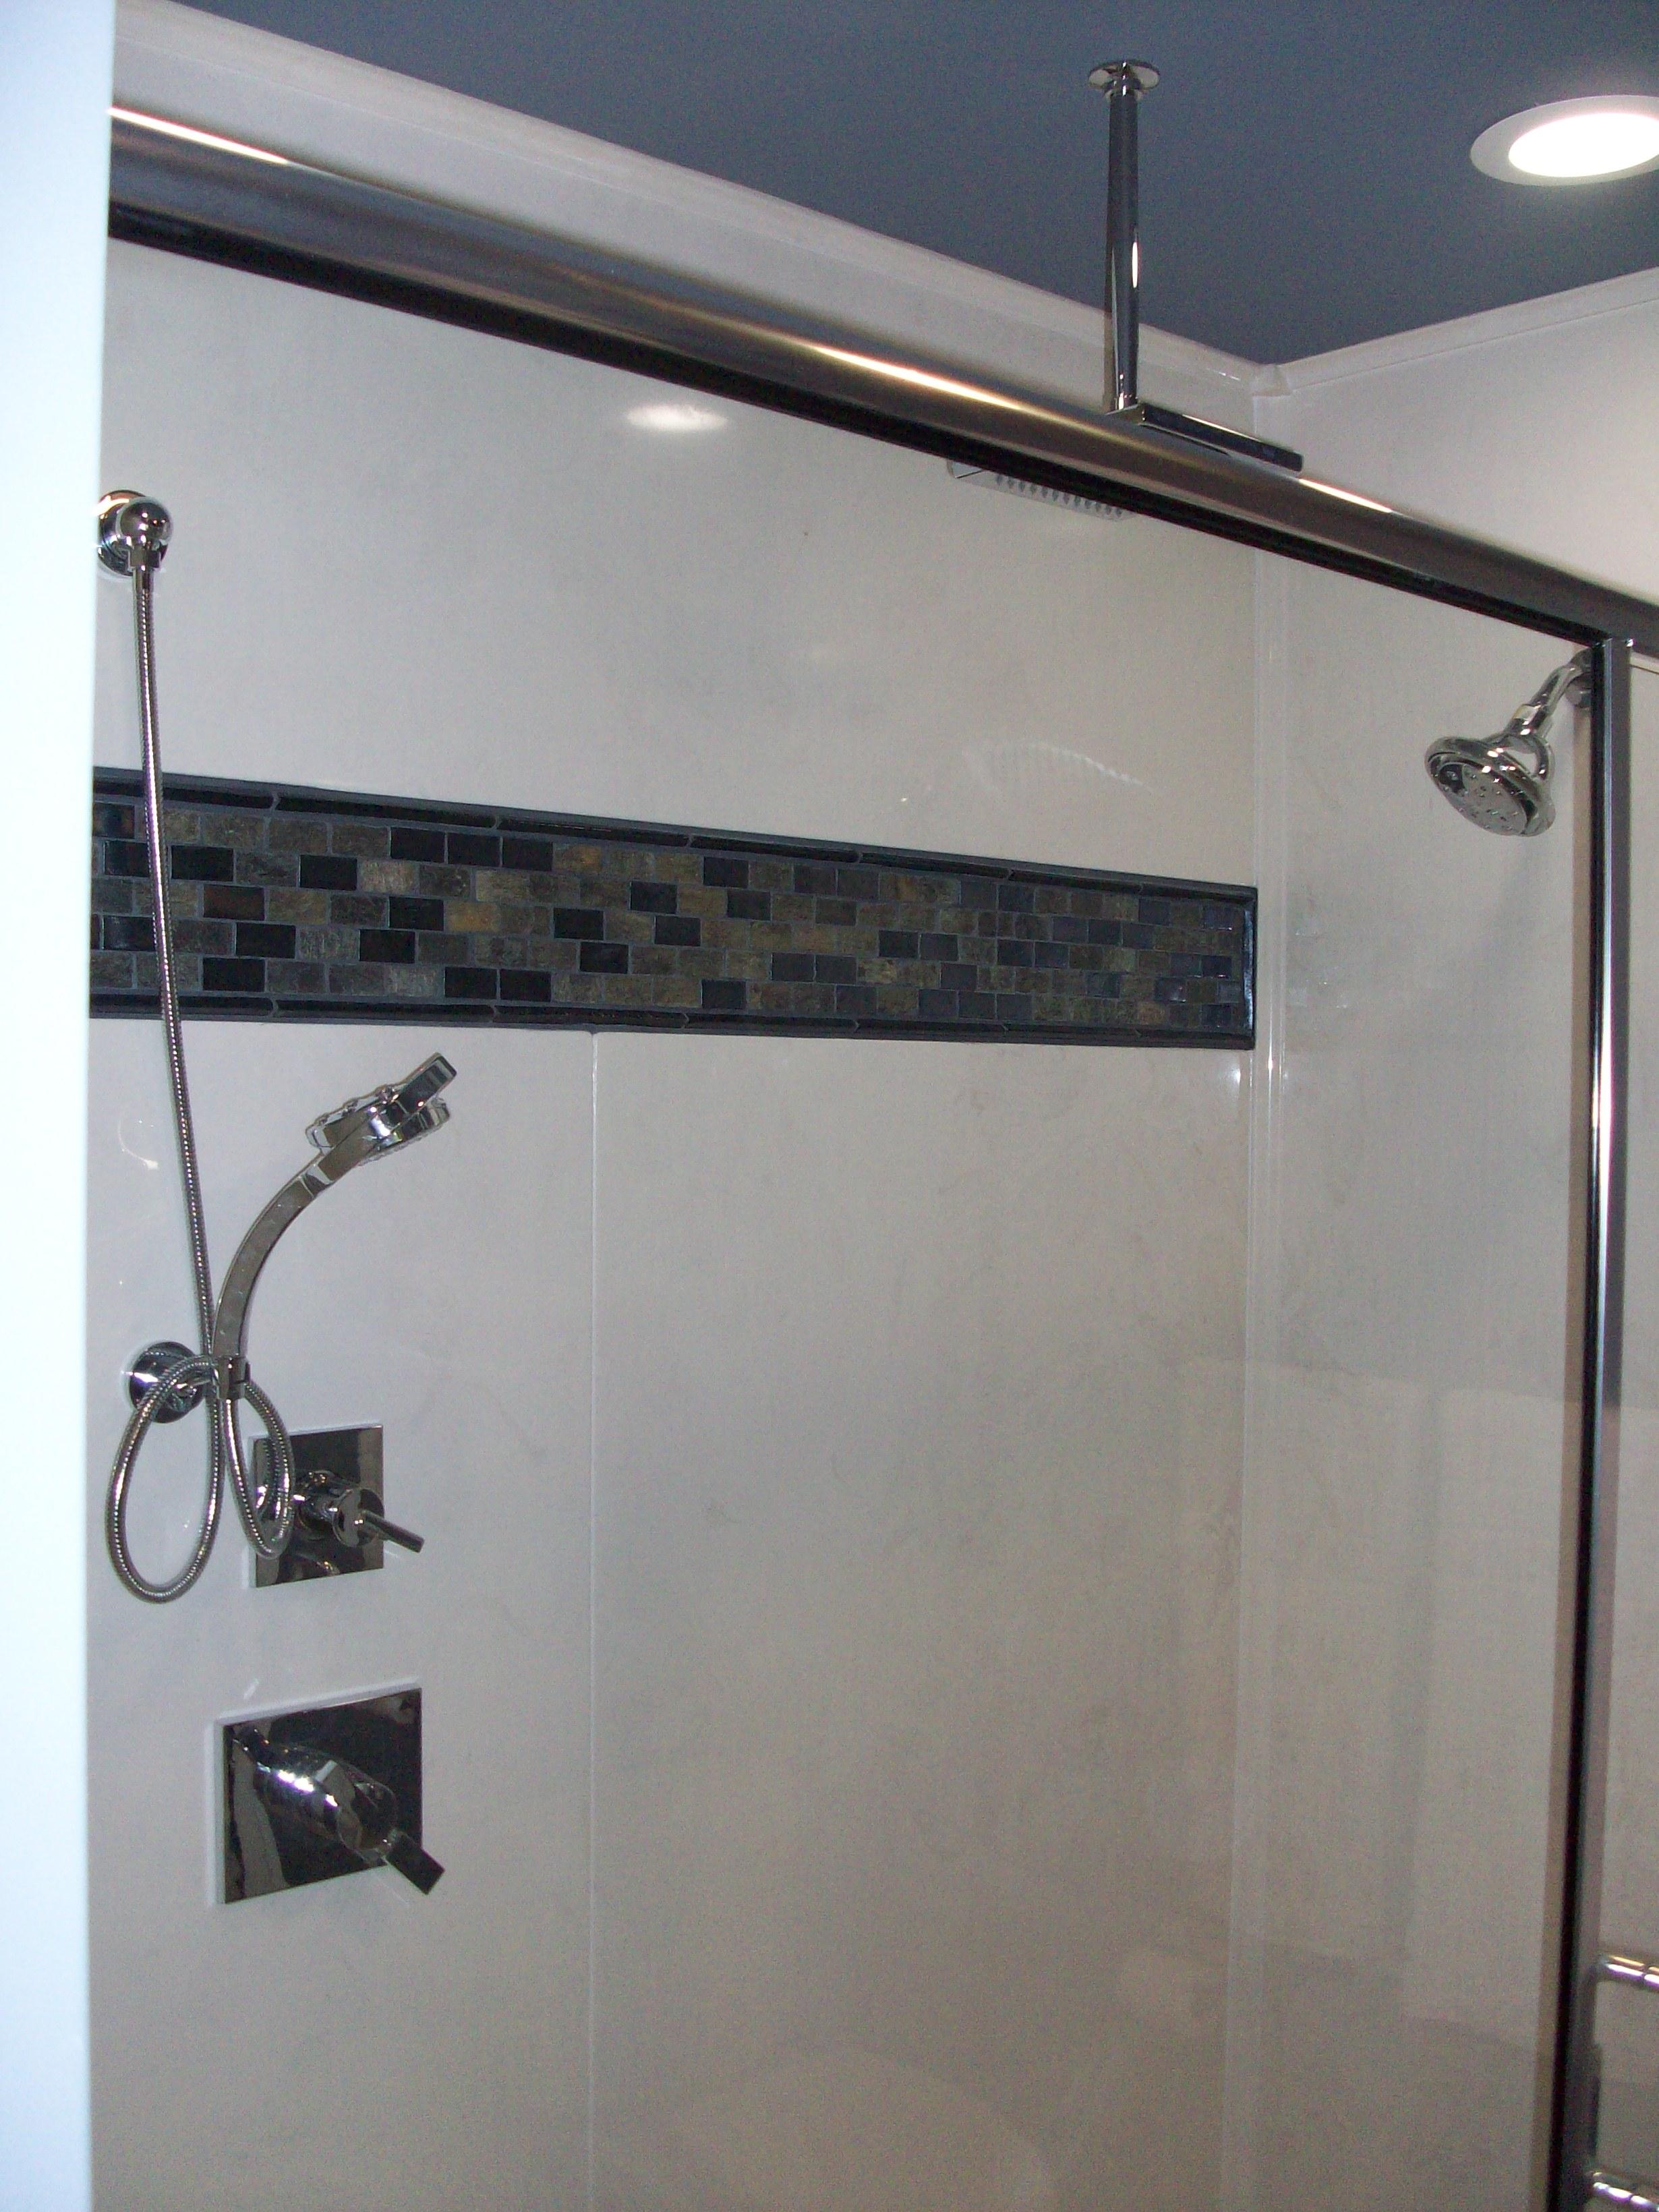 3 head shower with diverter